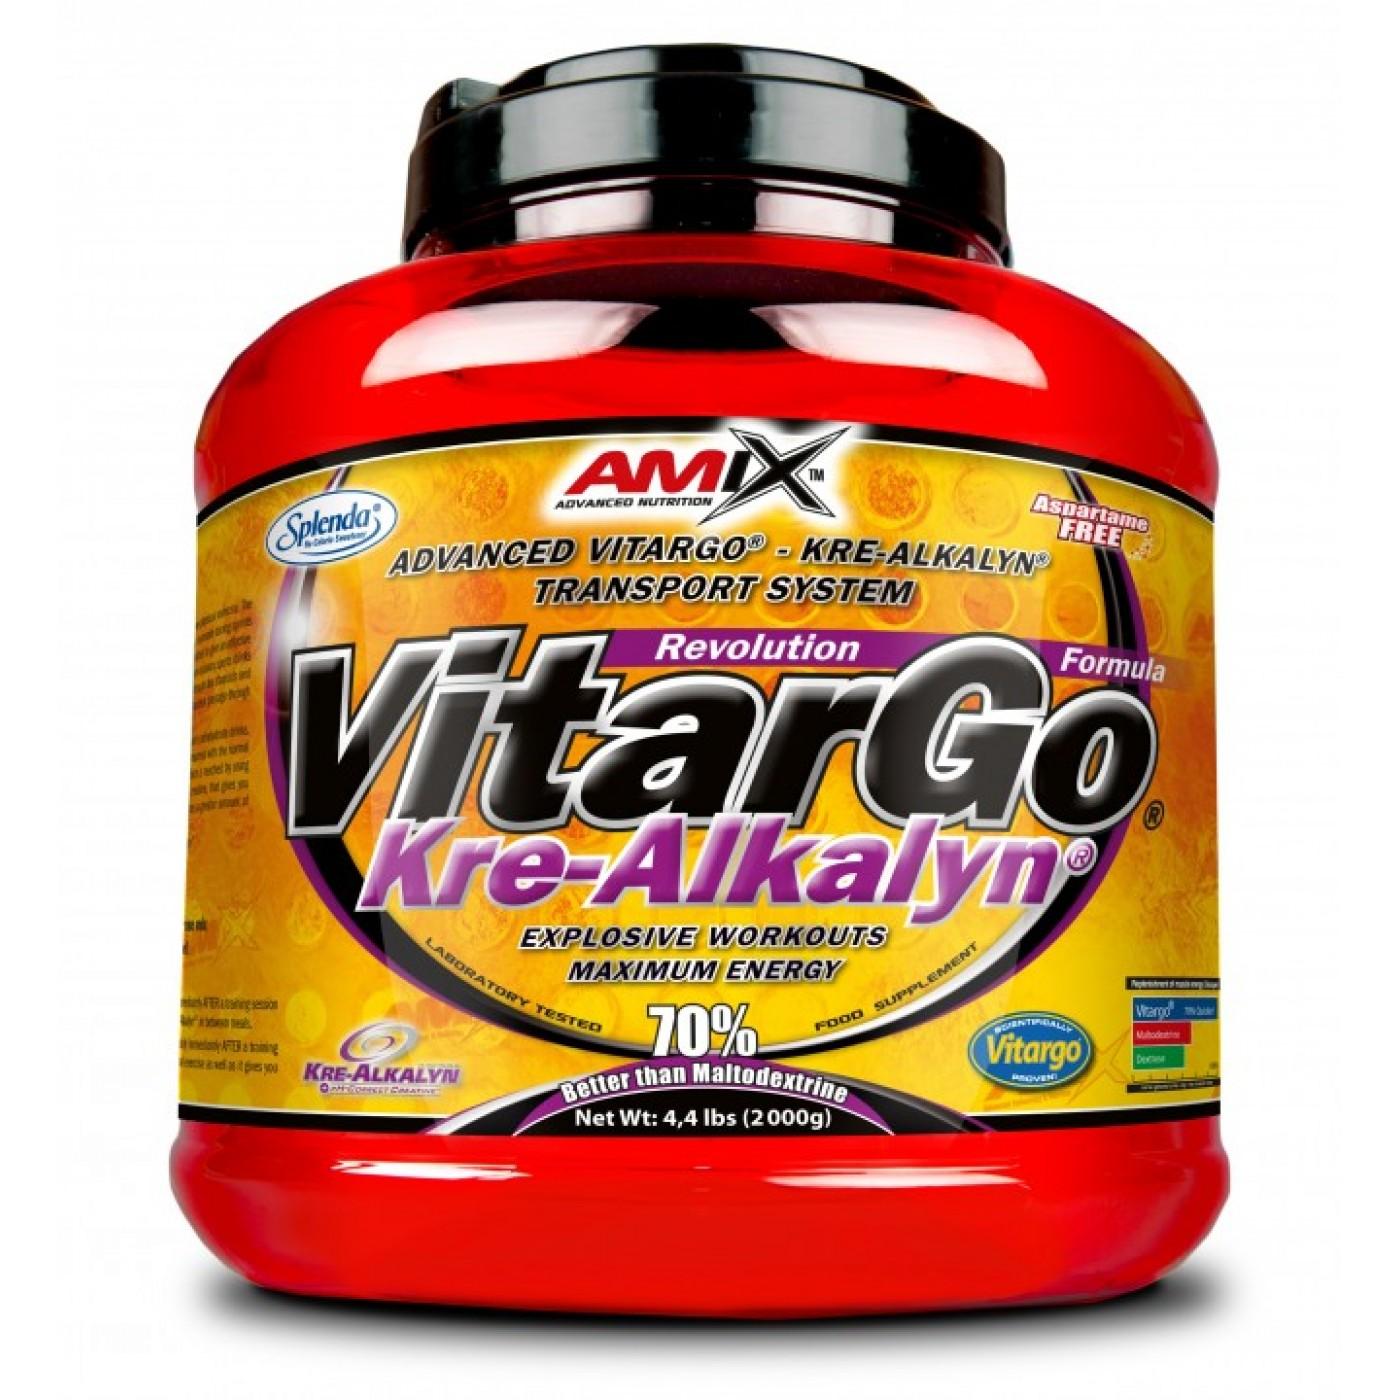 AMIX Vitargo + Kre-alkalyn